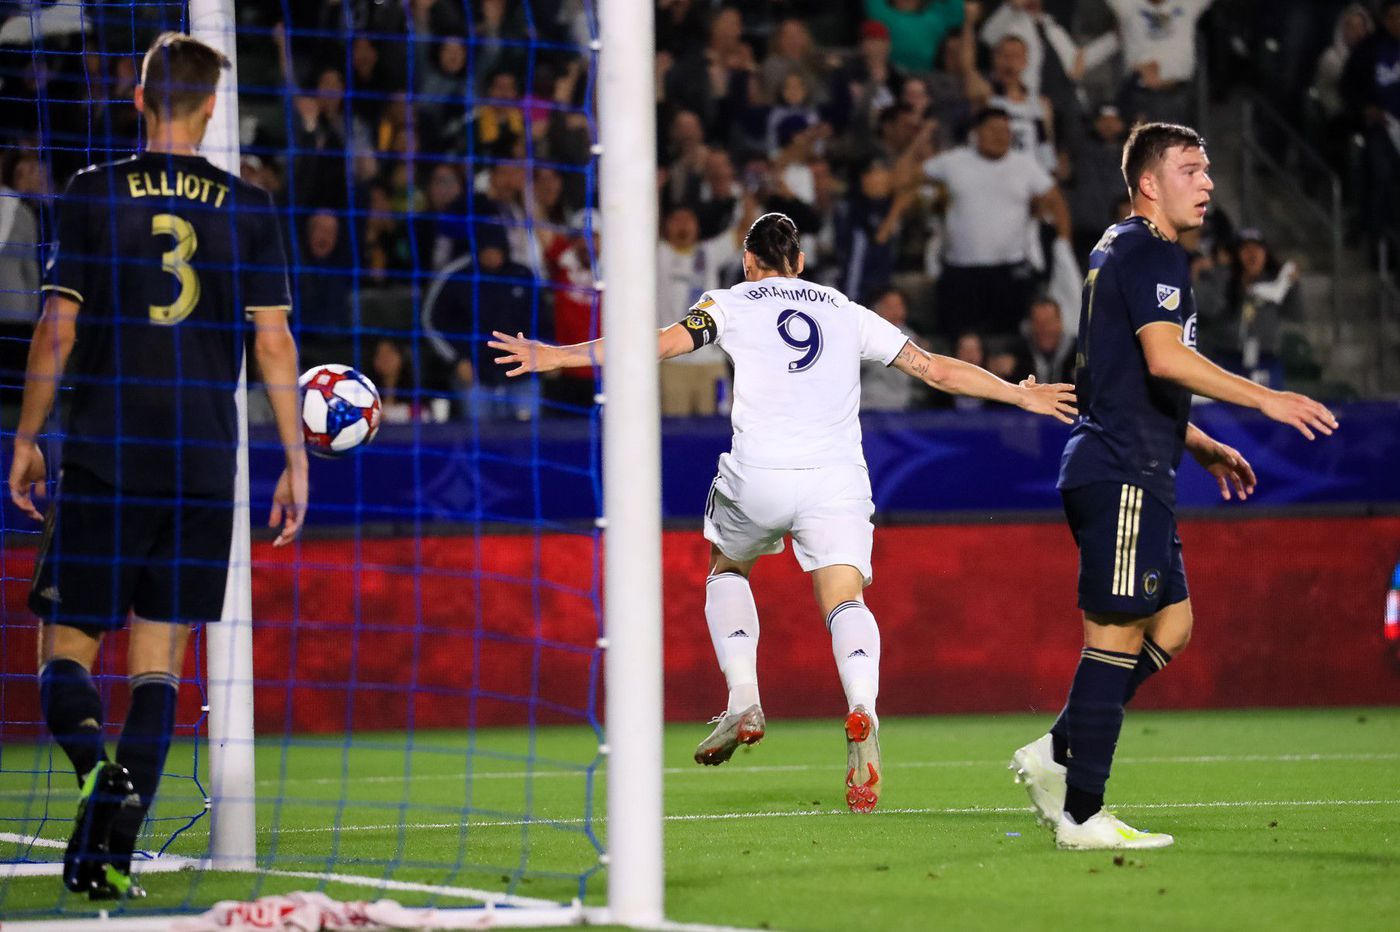 Zlatan Ibrahimovic goals deal Union 2-0 loss at Los Angeles Galaxy